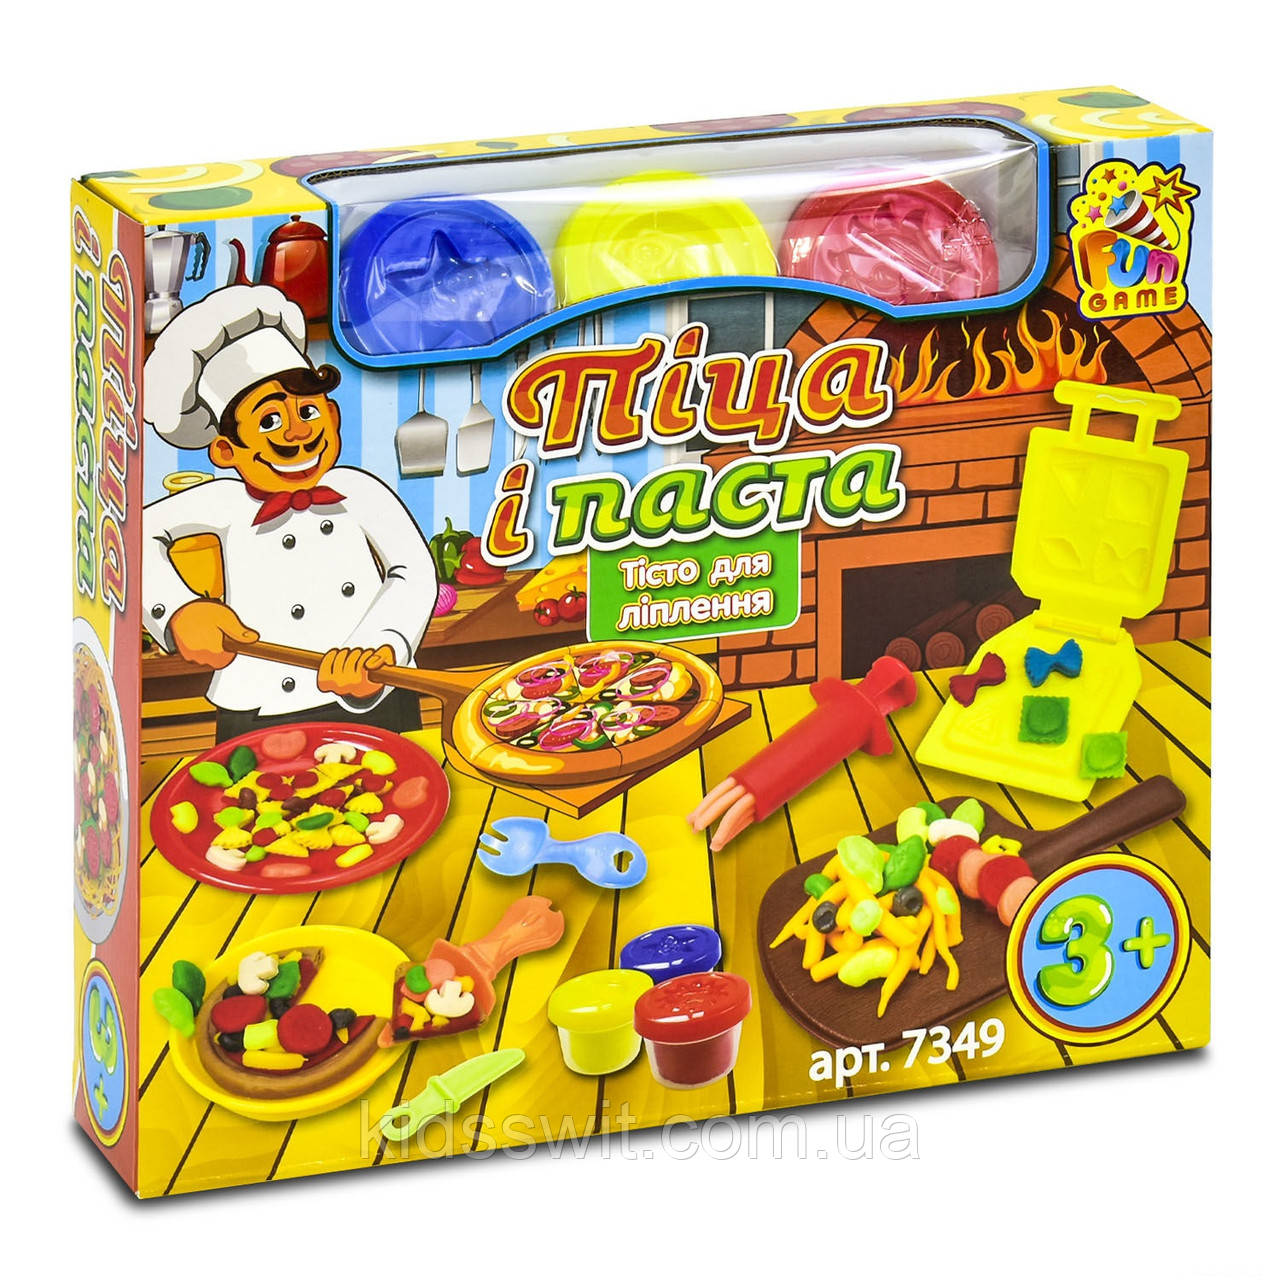 "Тесто для лепки ""Піца і паста"" от "" Fun game"", 7349"